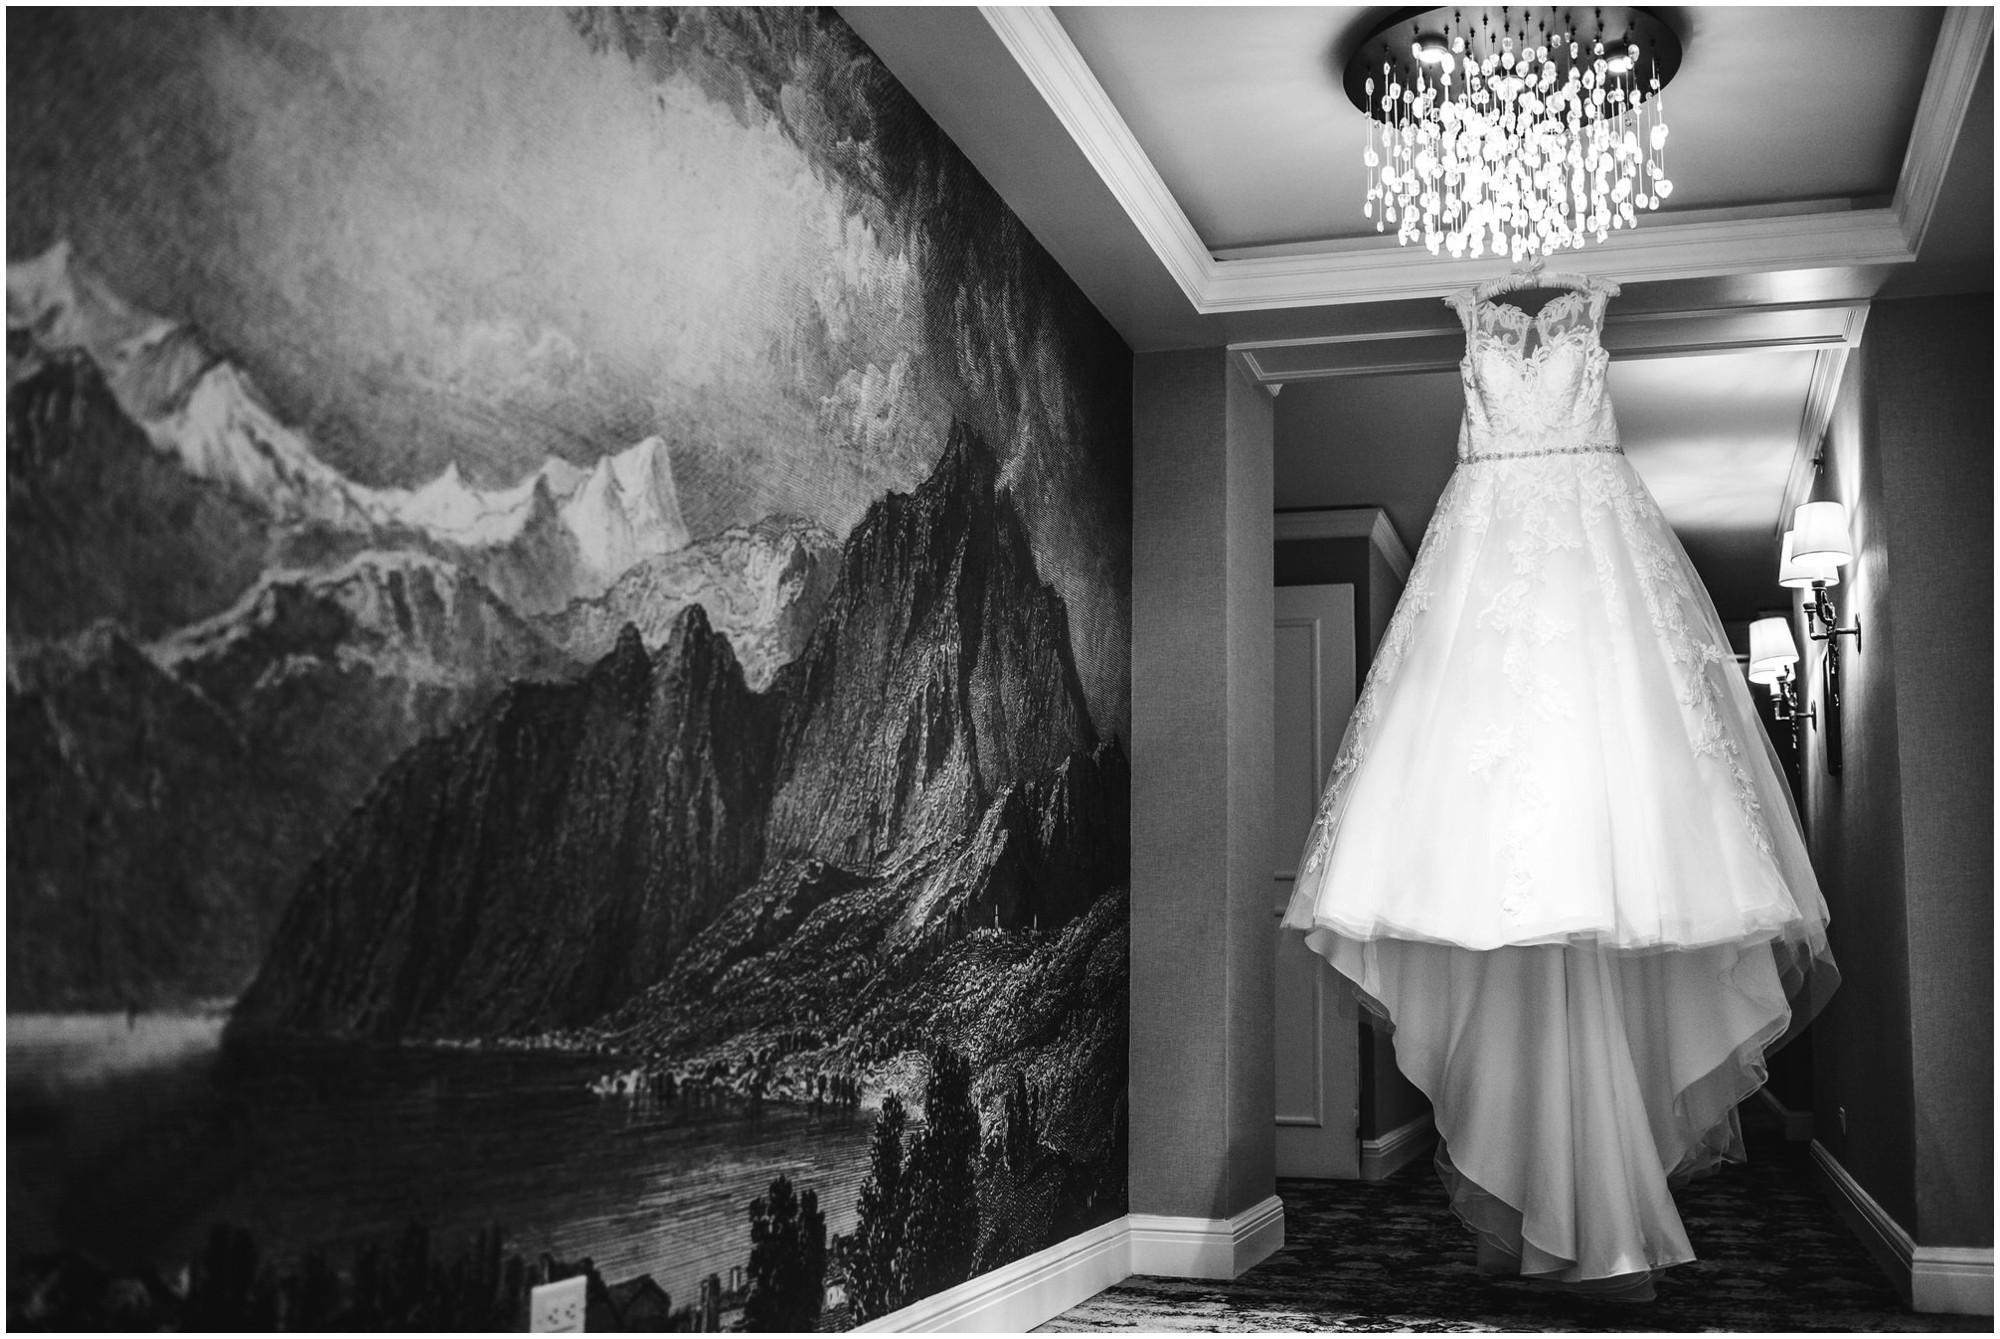 03-Snowmass-colorado-winter-wedding-bw.jpg